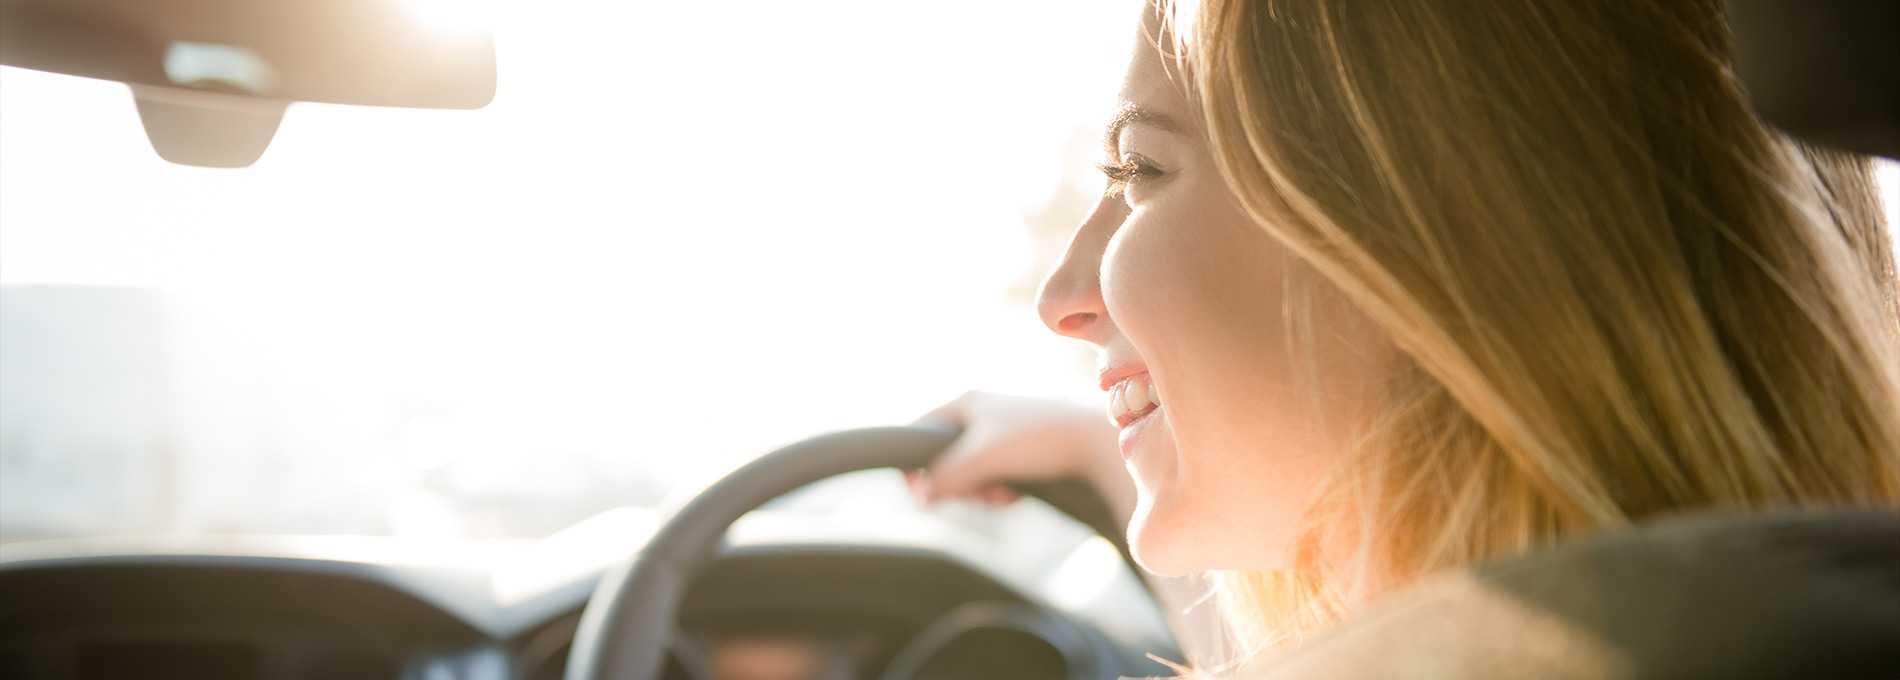 GPS Technologies: Fleet & Vehicle Tracking Solutions